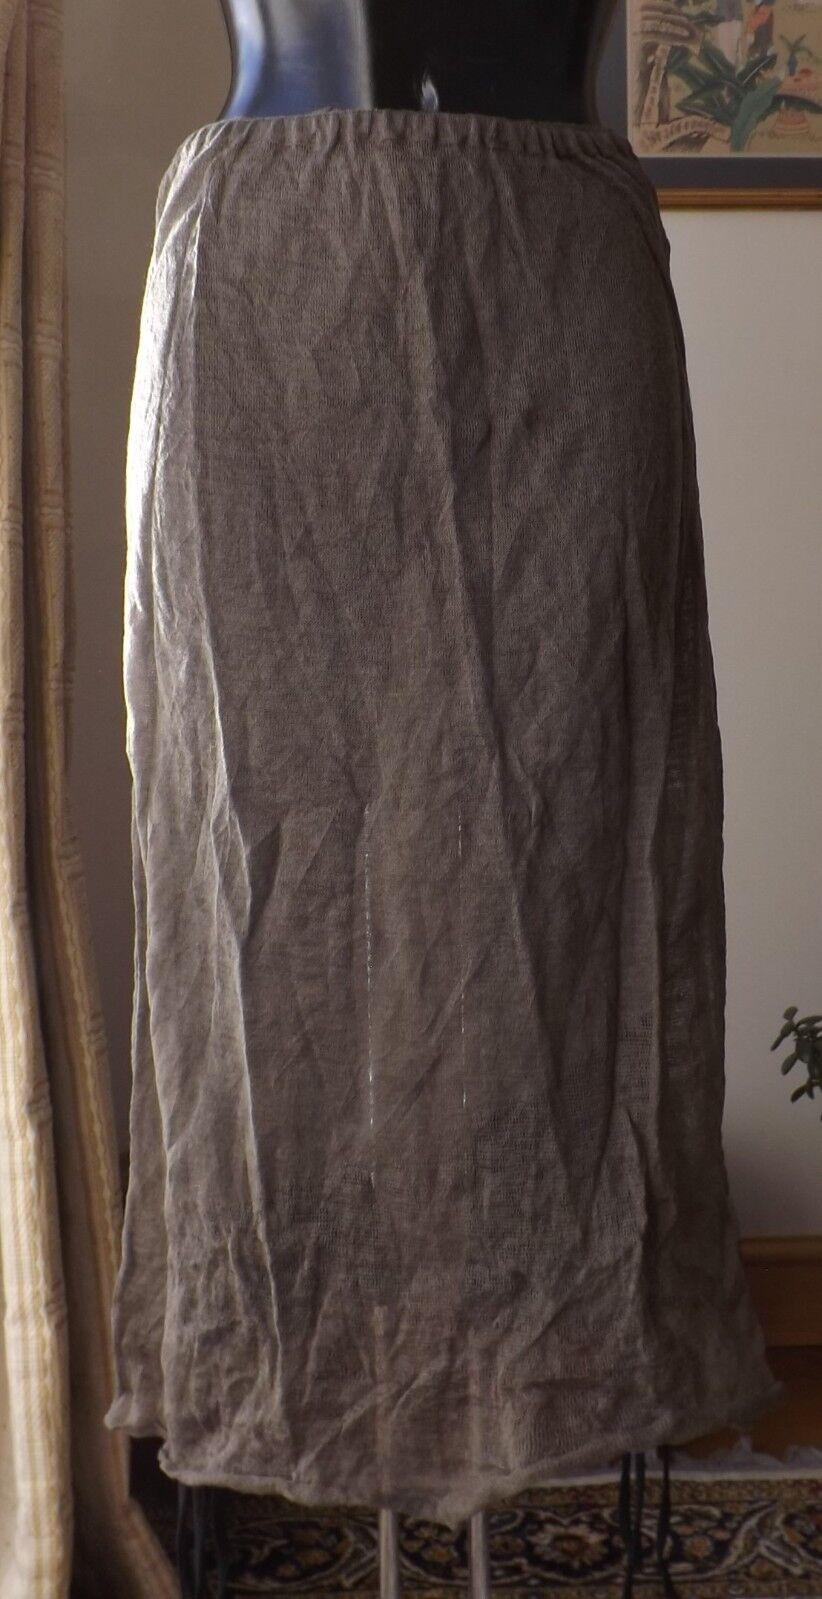 Women wear Sarah Pacini knitwear vison colour skirt one size  SP 1088 BNWT